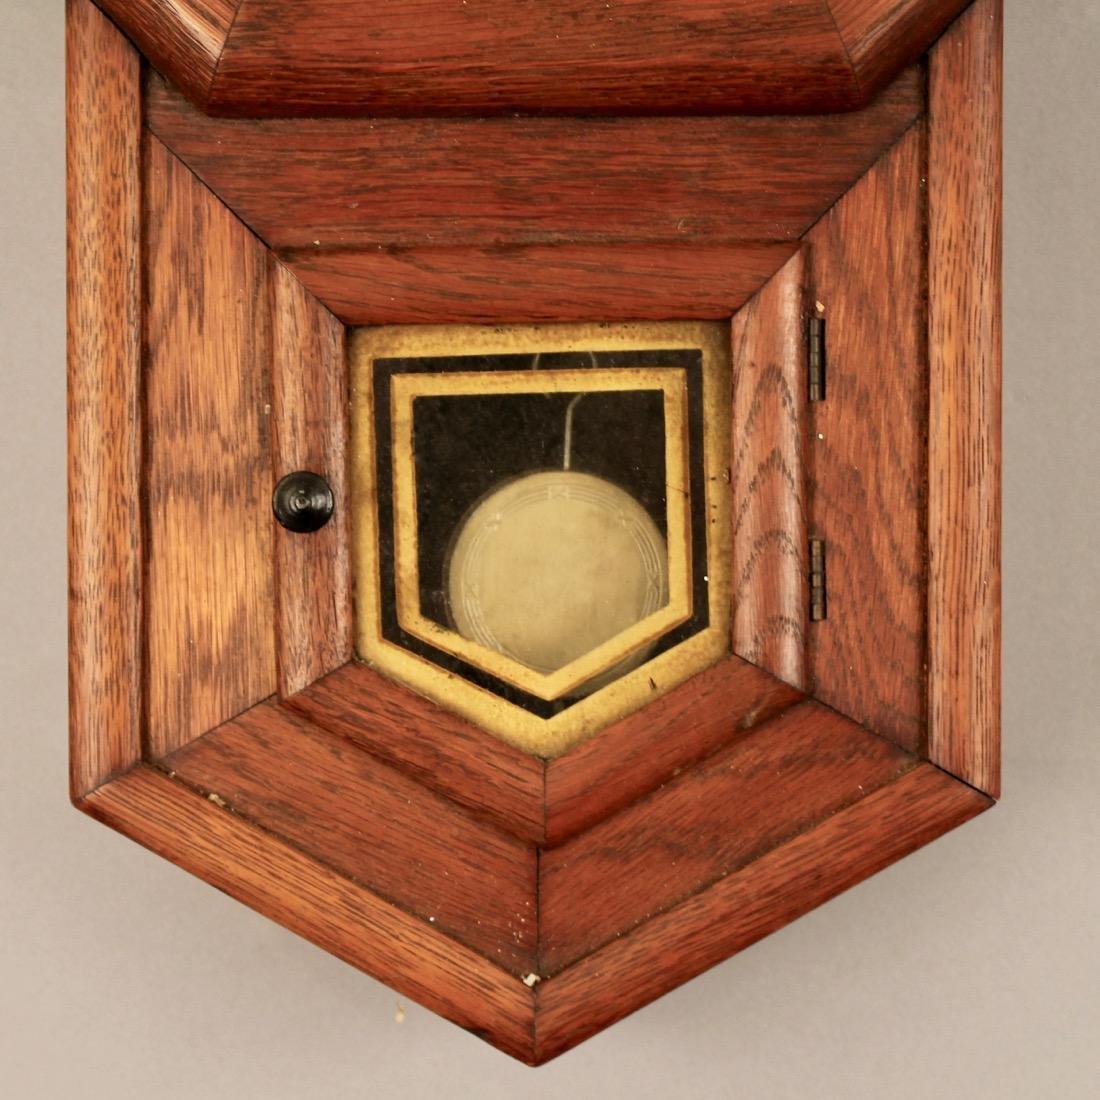 Oak Sessions Regulator Clock - 3